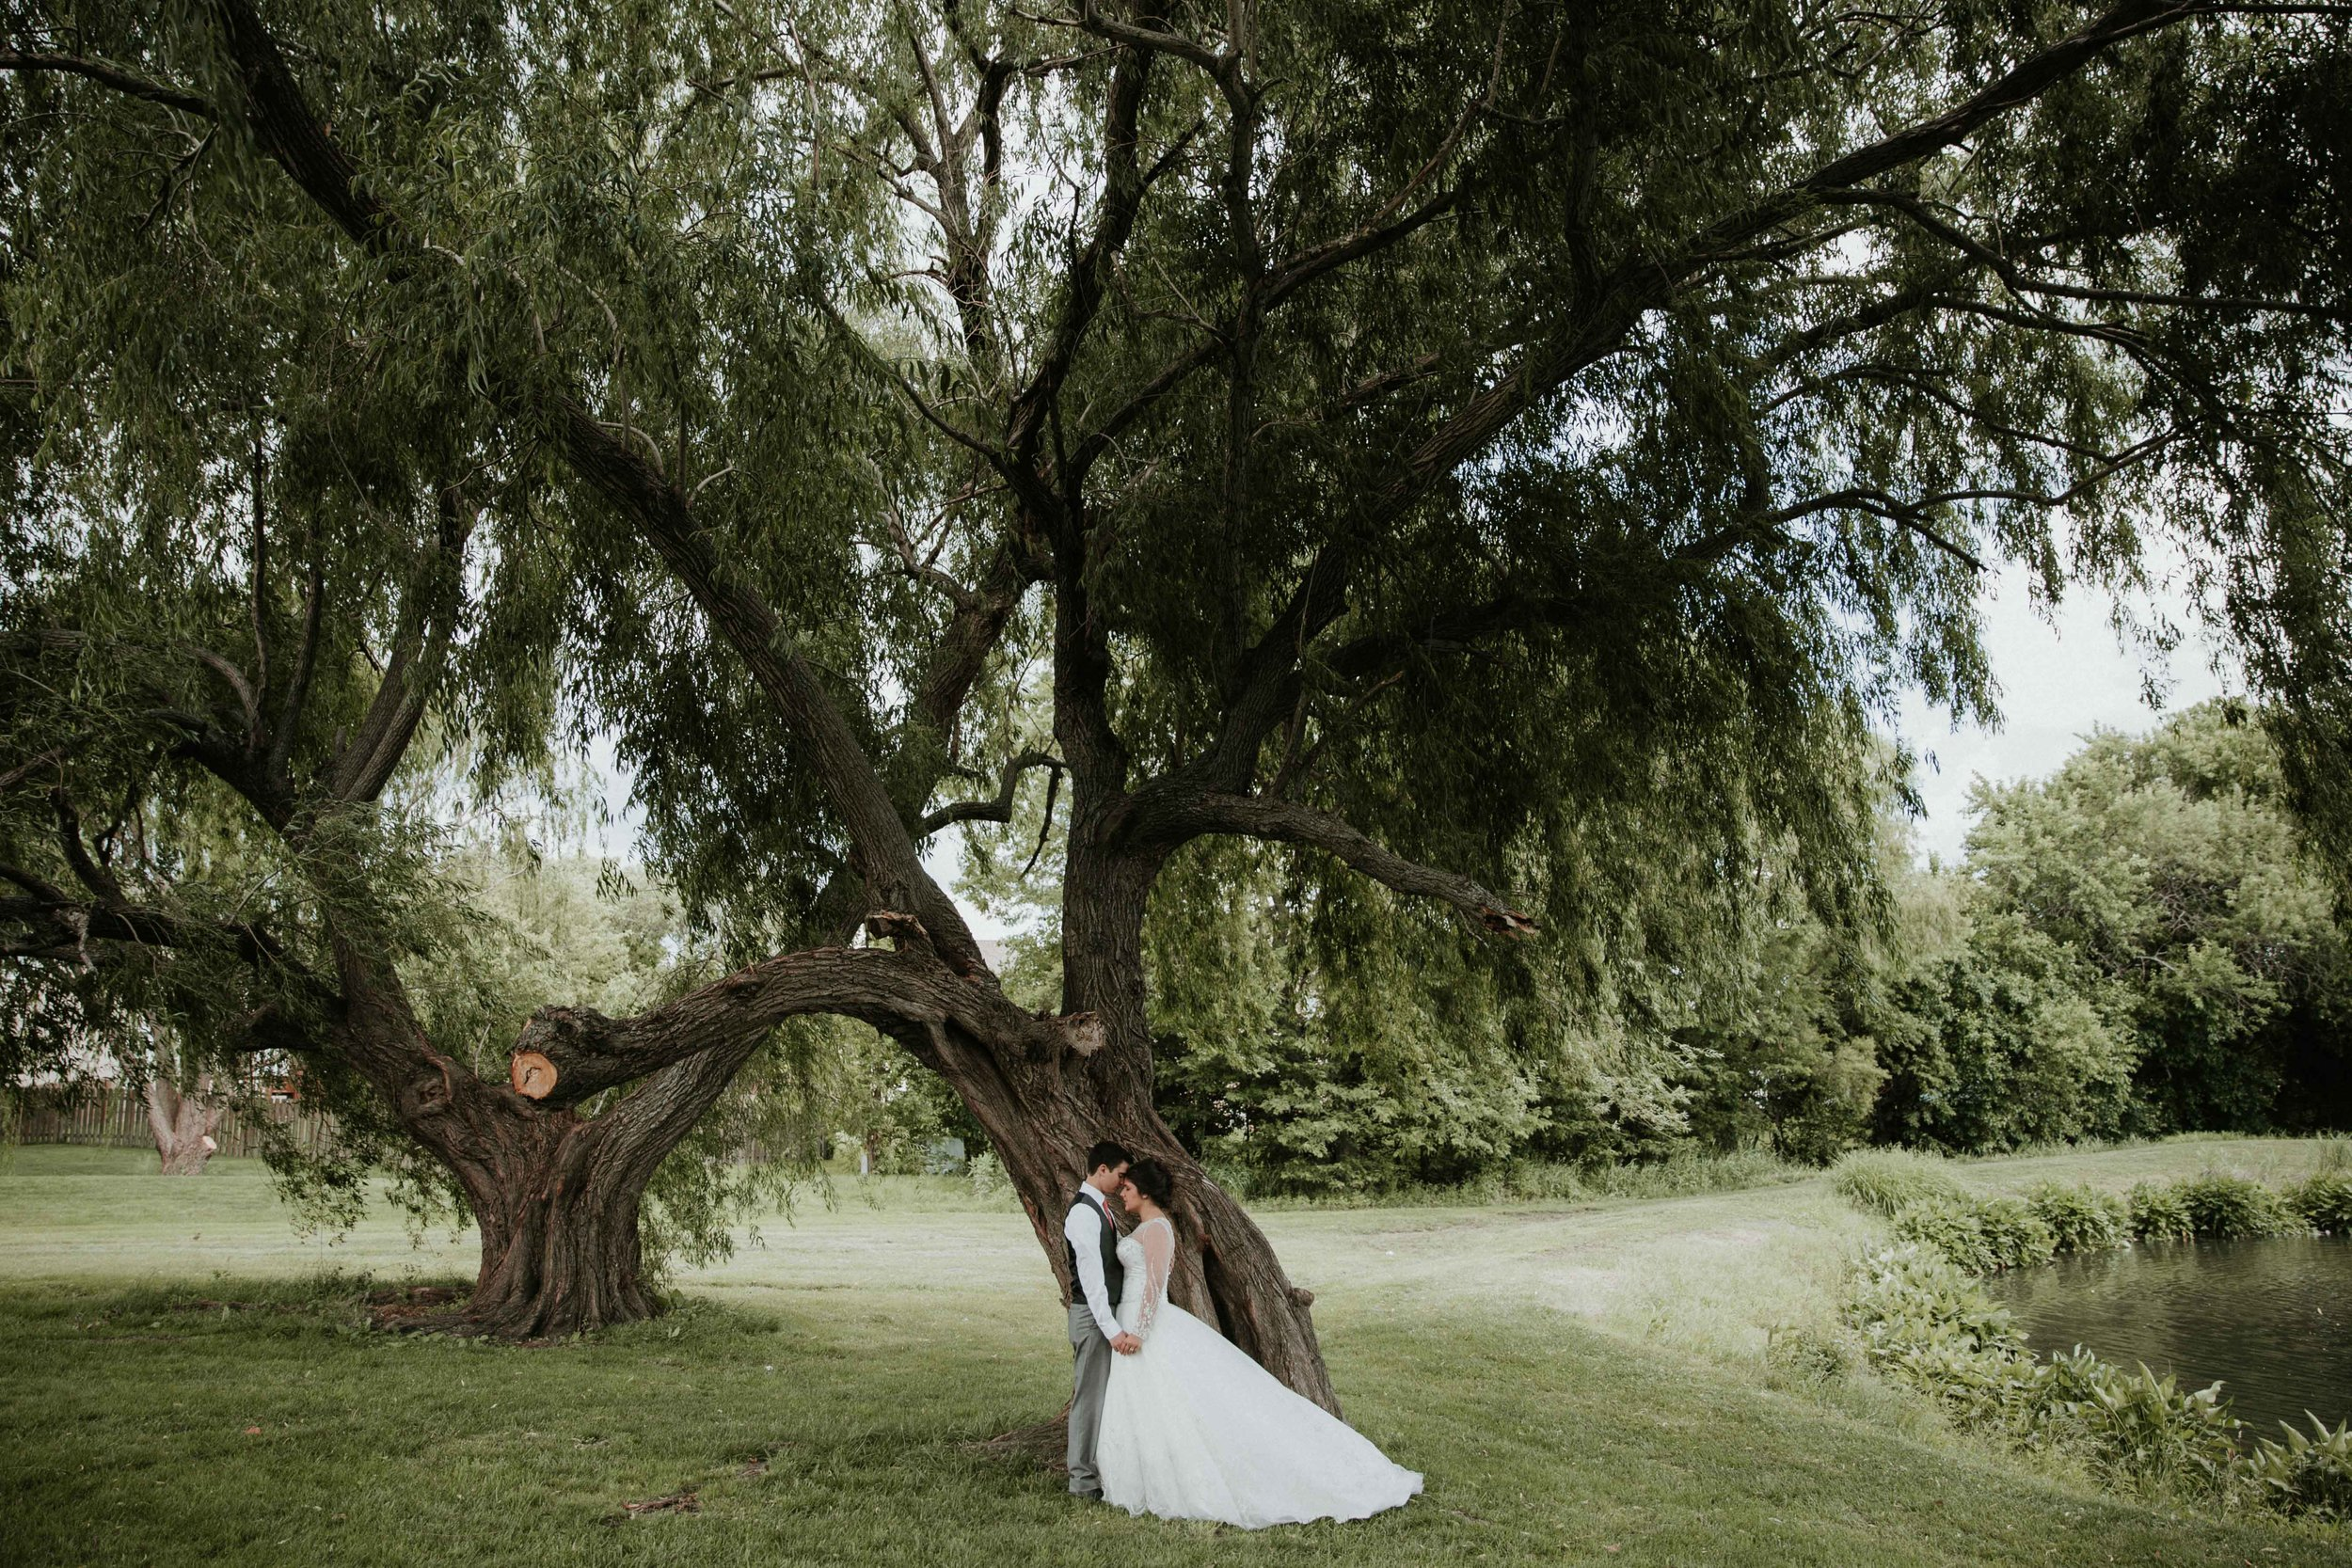 Northwest Arkansas Destination Wedding Photographer-1-4.jpg